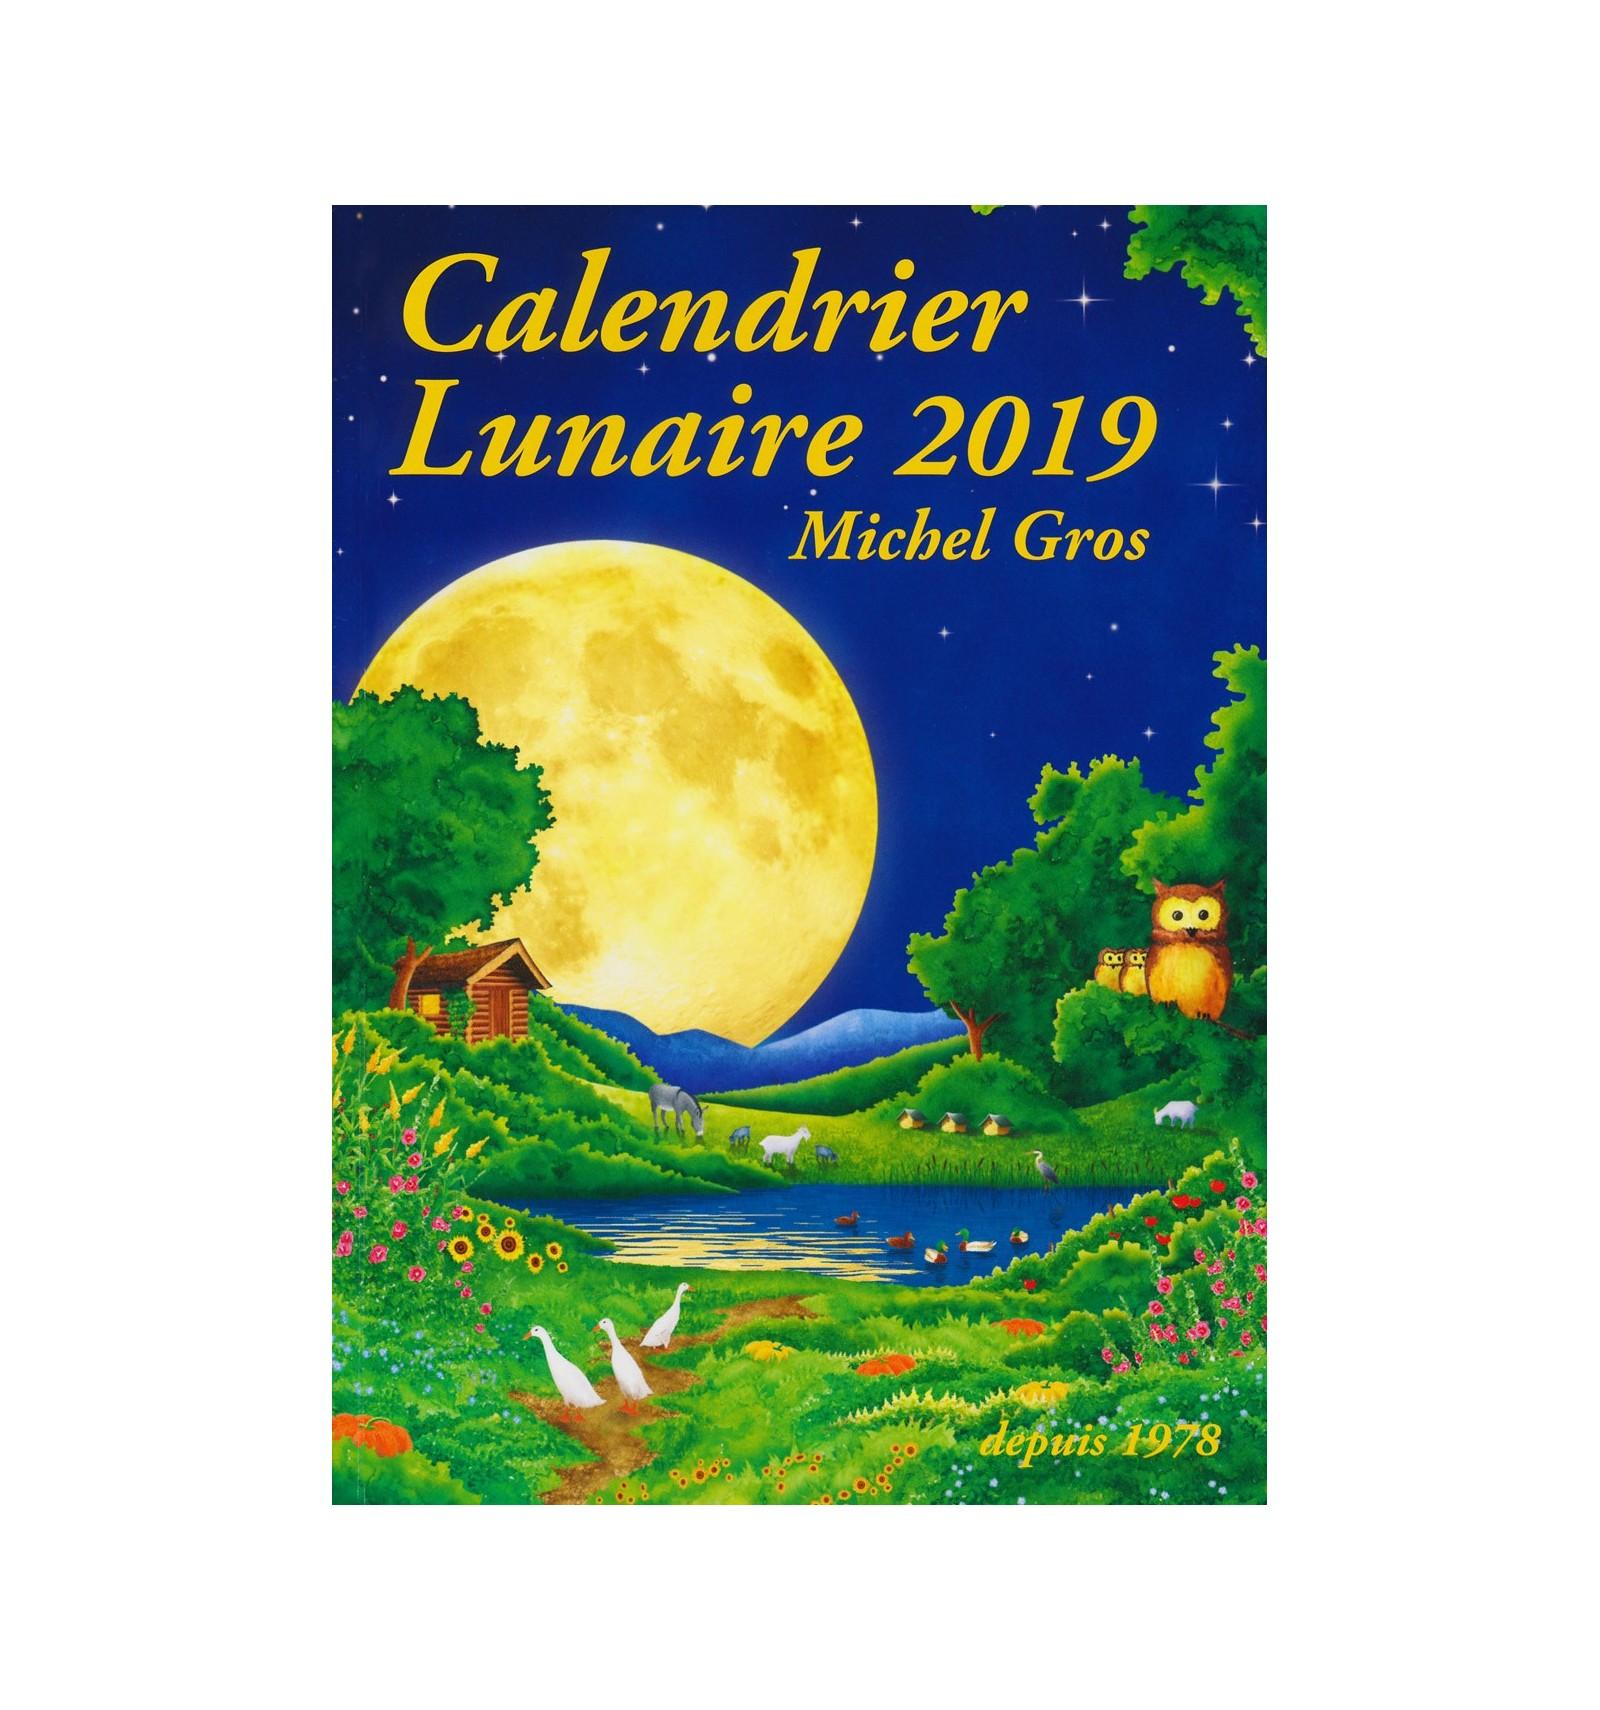 Calendrier lunaire 2019 Diffusion Rosicrucienne